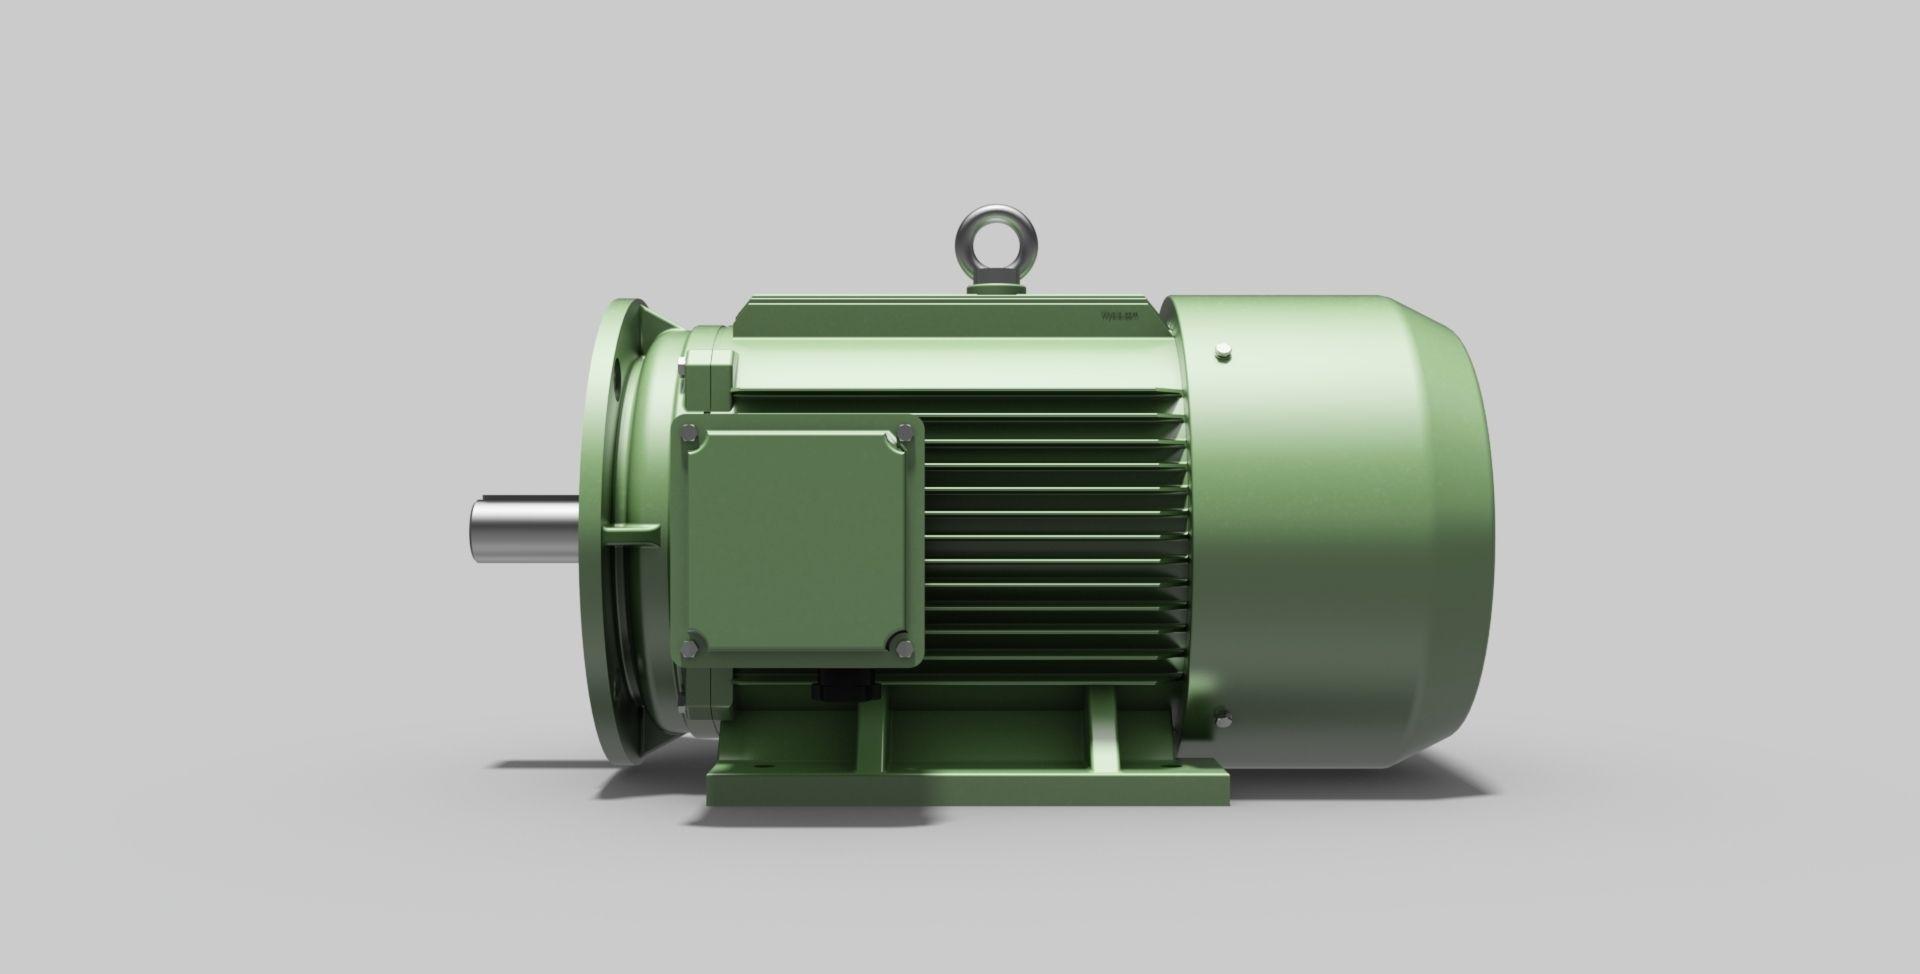 180L-B35 Right - Electric Motor - Free 3D CAD Model free 3D model